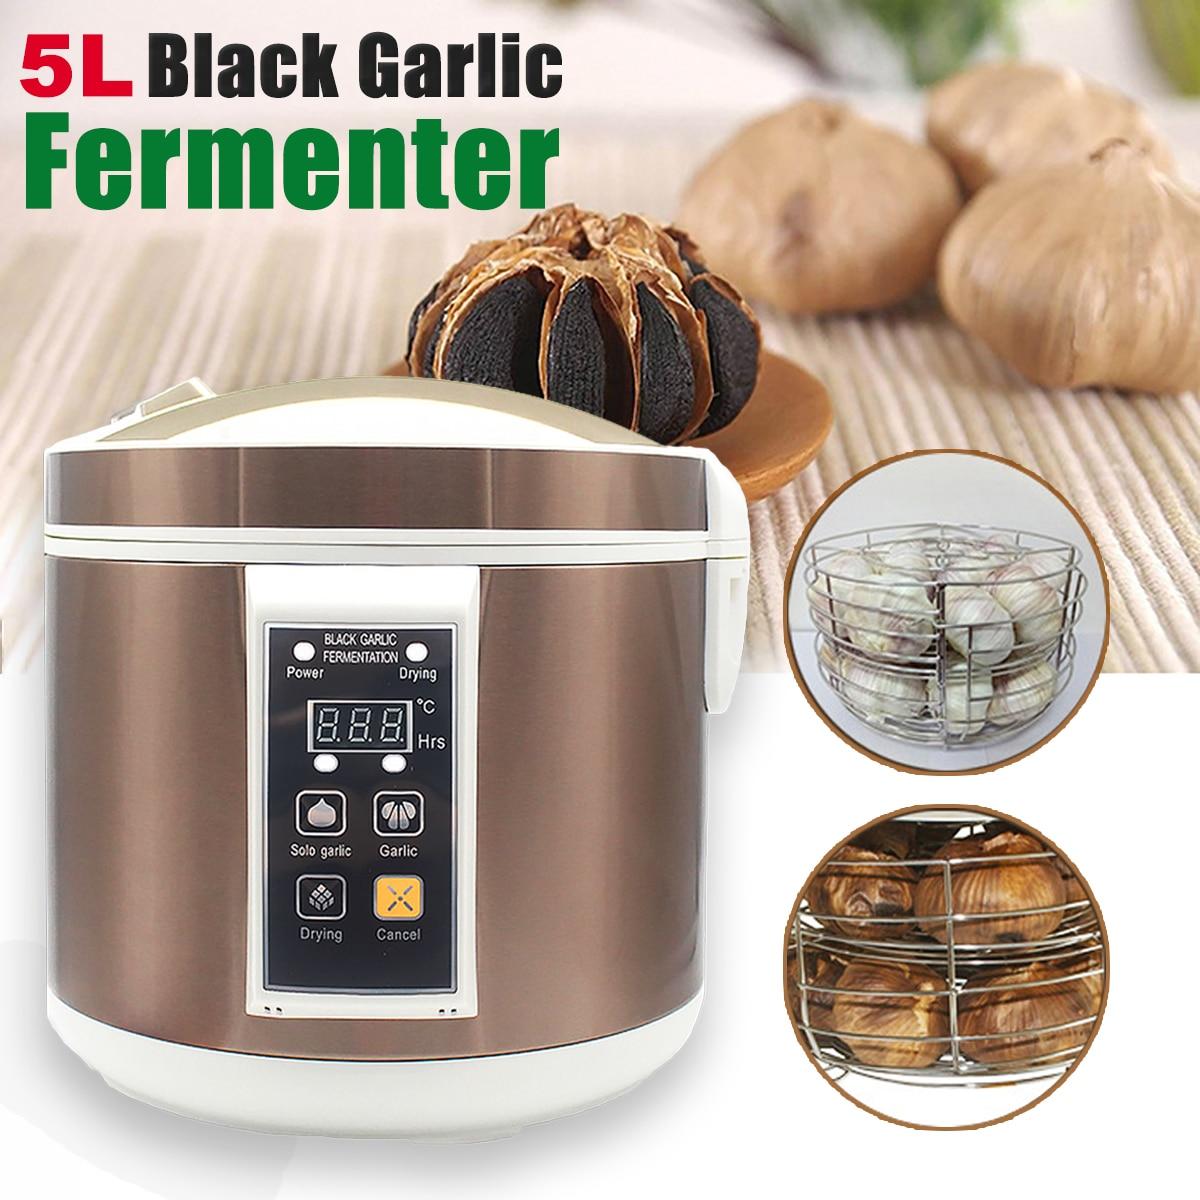 90W 5L Intelligent Black Garlic Fermenter Automatic Fermentation Machine Household DIY Zymolysis Pot Maker Home Appliances